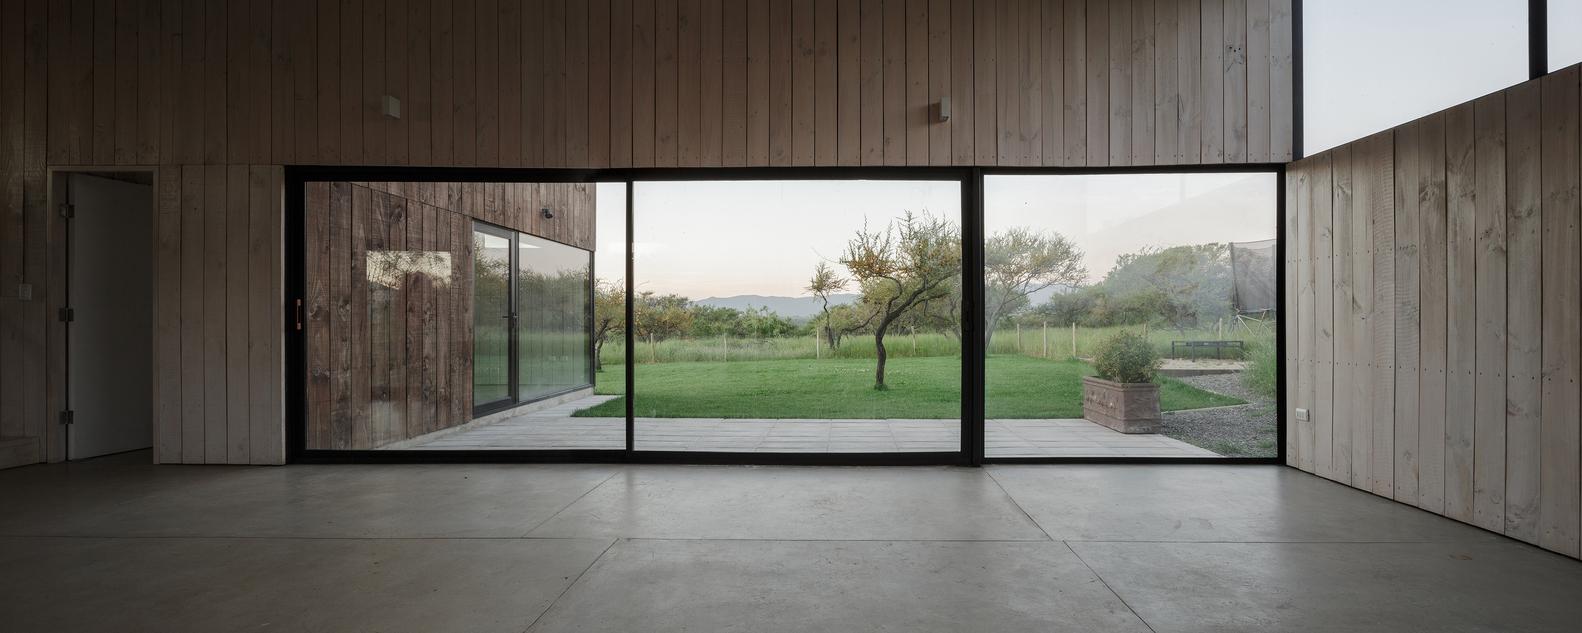 CML House / Ricardo Torrejon & Arturo Chadwick (13)